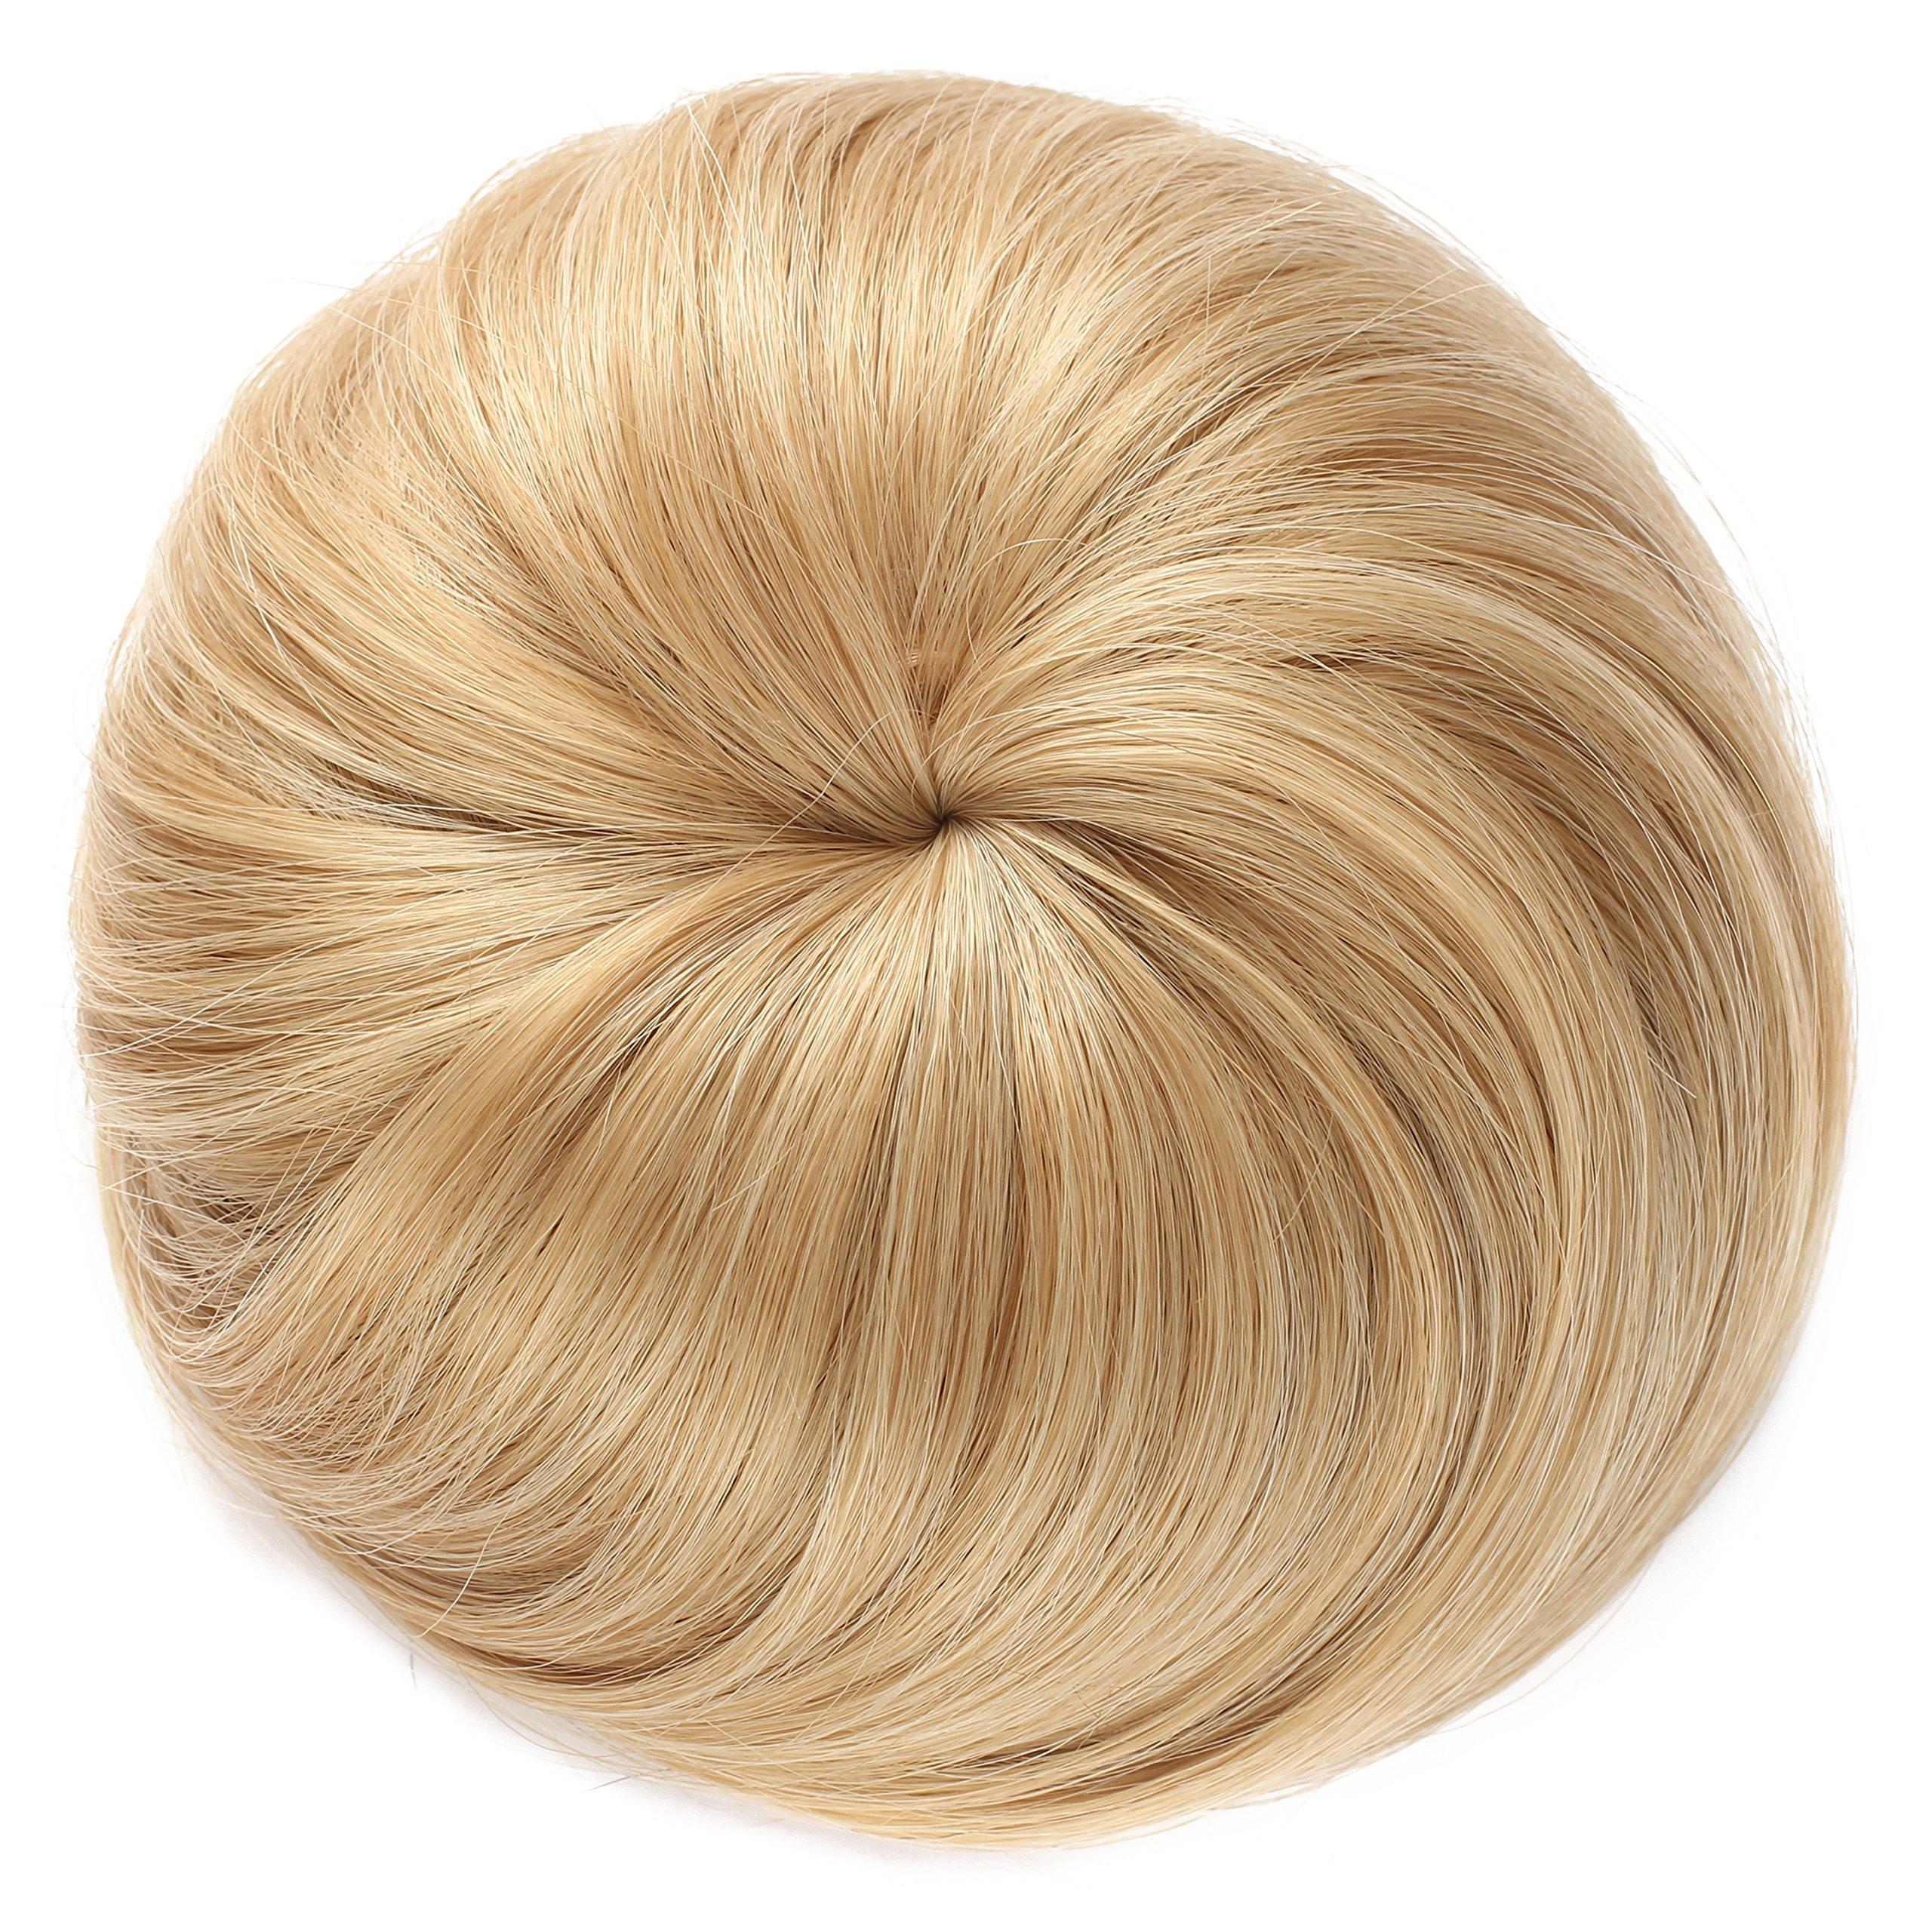 OneDor Synthetic Hair Bun Extension Donut Chignon Hairpiece Wig (27/613)